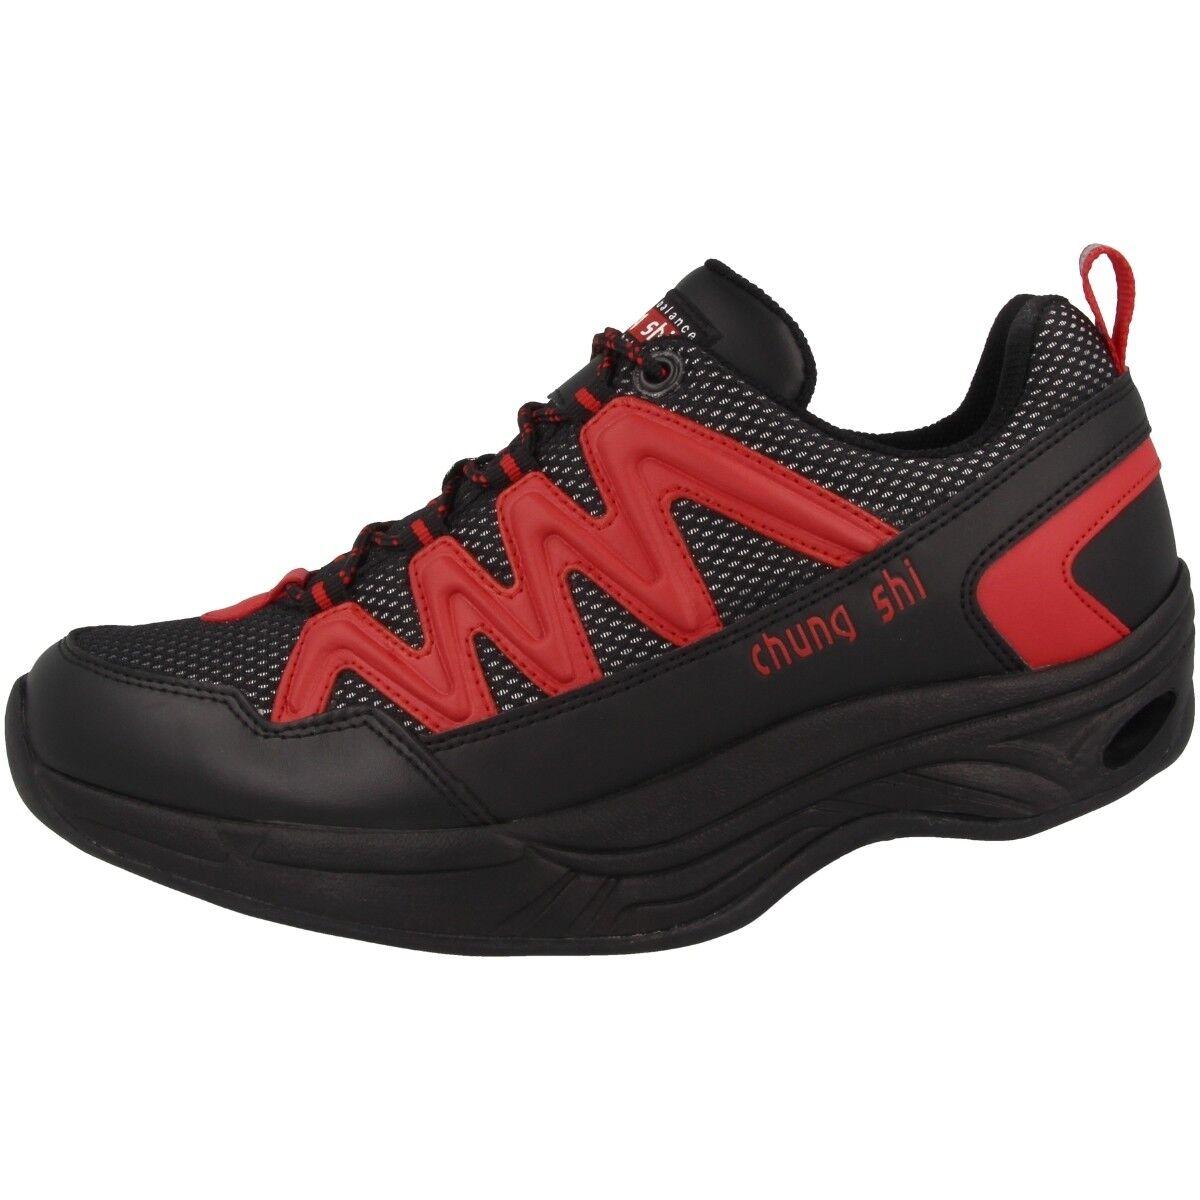 Chung Shi Comfort Step Level 1 Magic Women's shoes Health Trainers 9101005